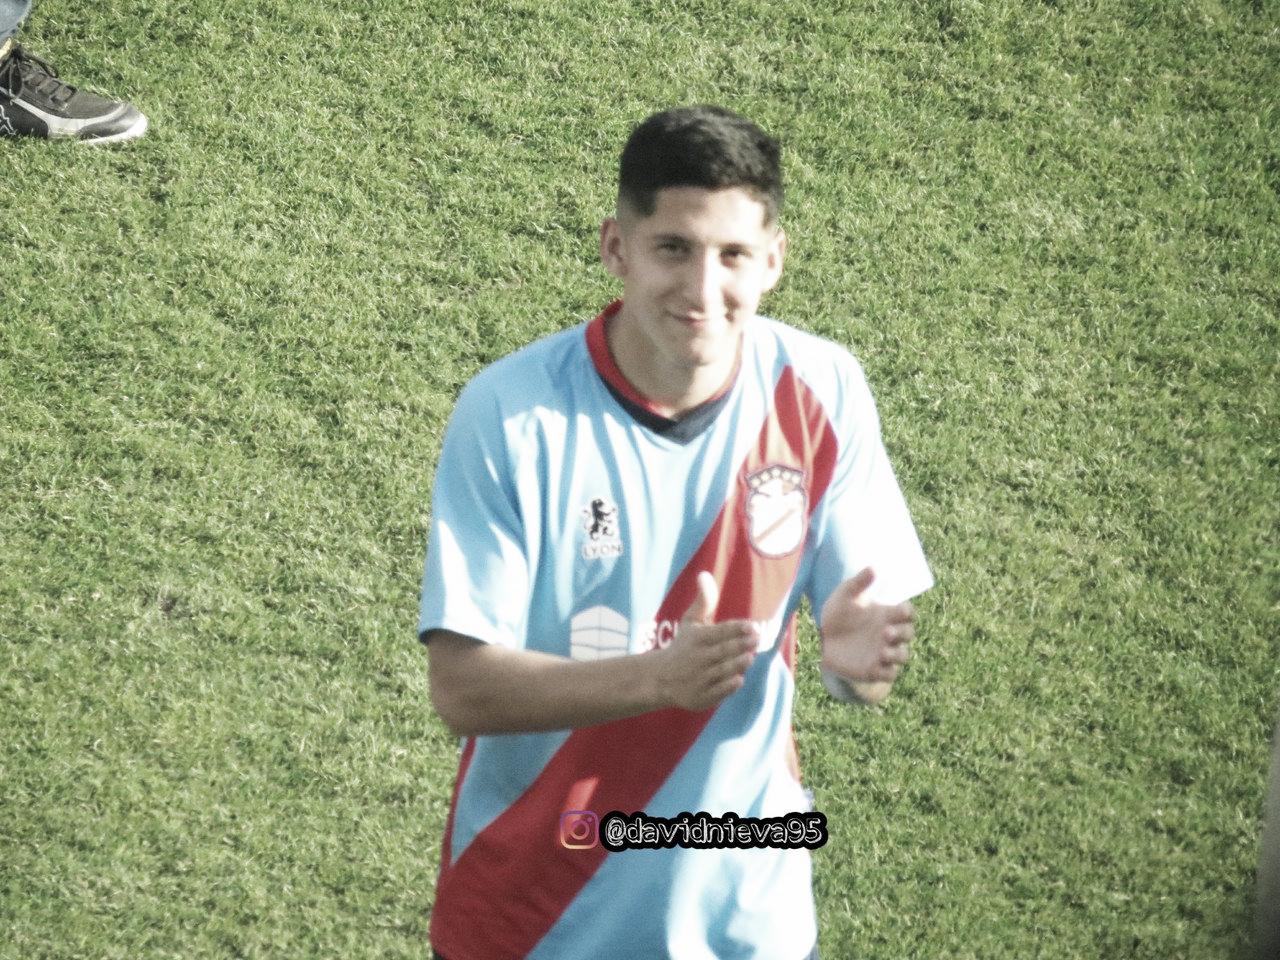 Necul, la figura de la goleada de Arsenal